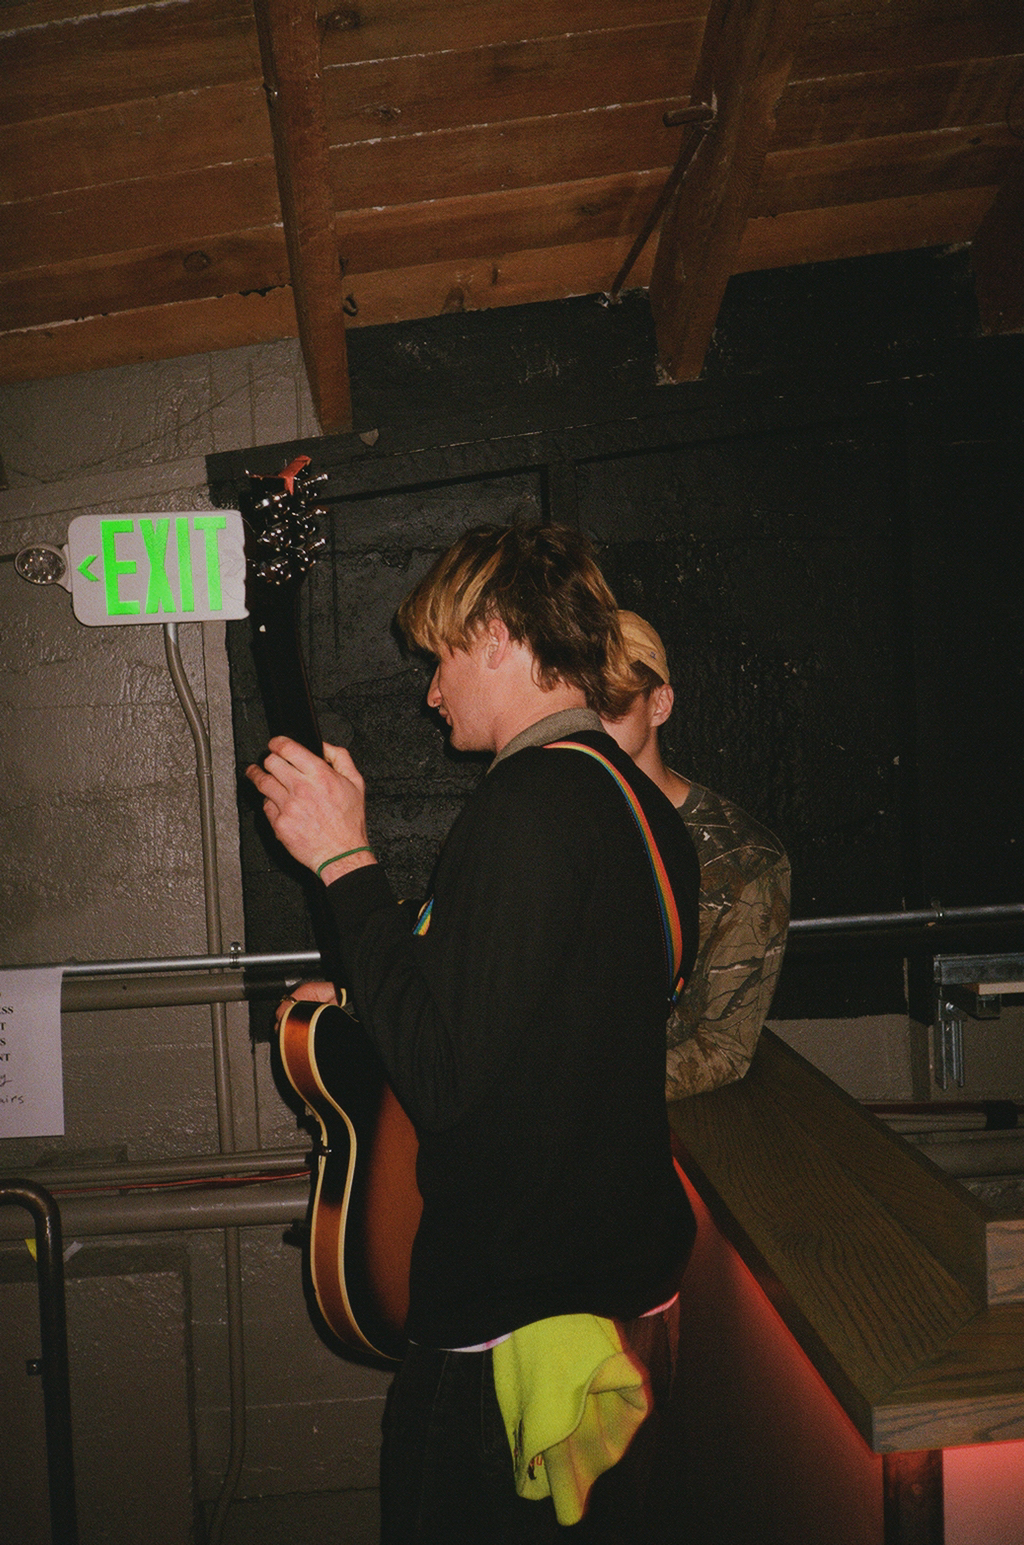 Kevin Fielding: Neon Exit